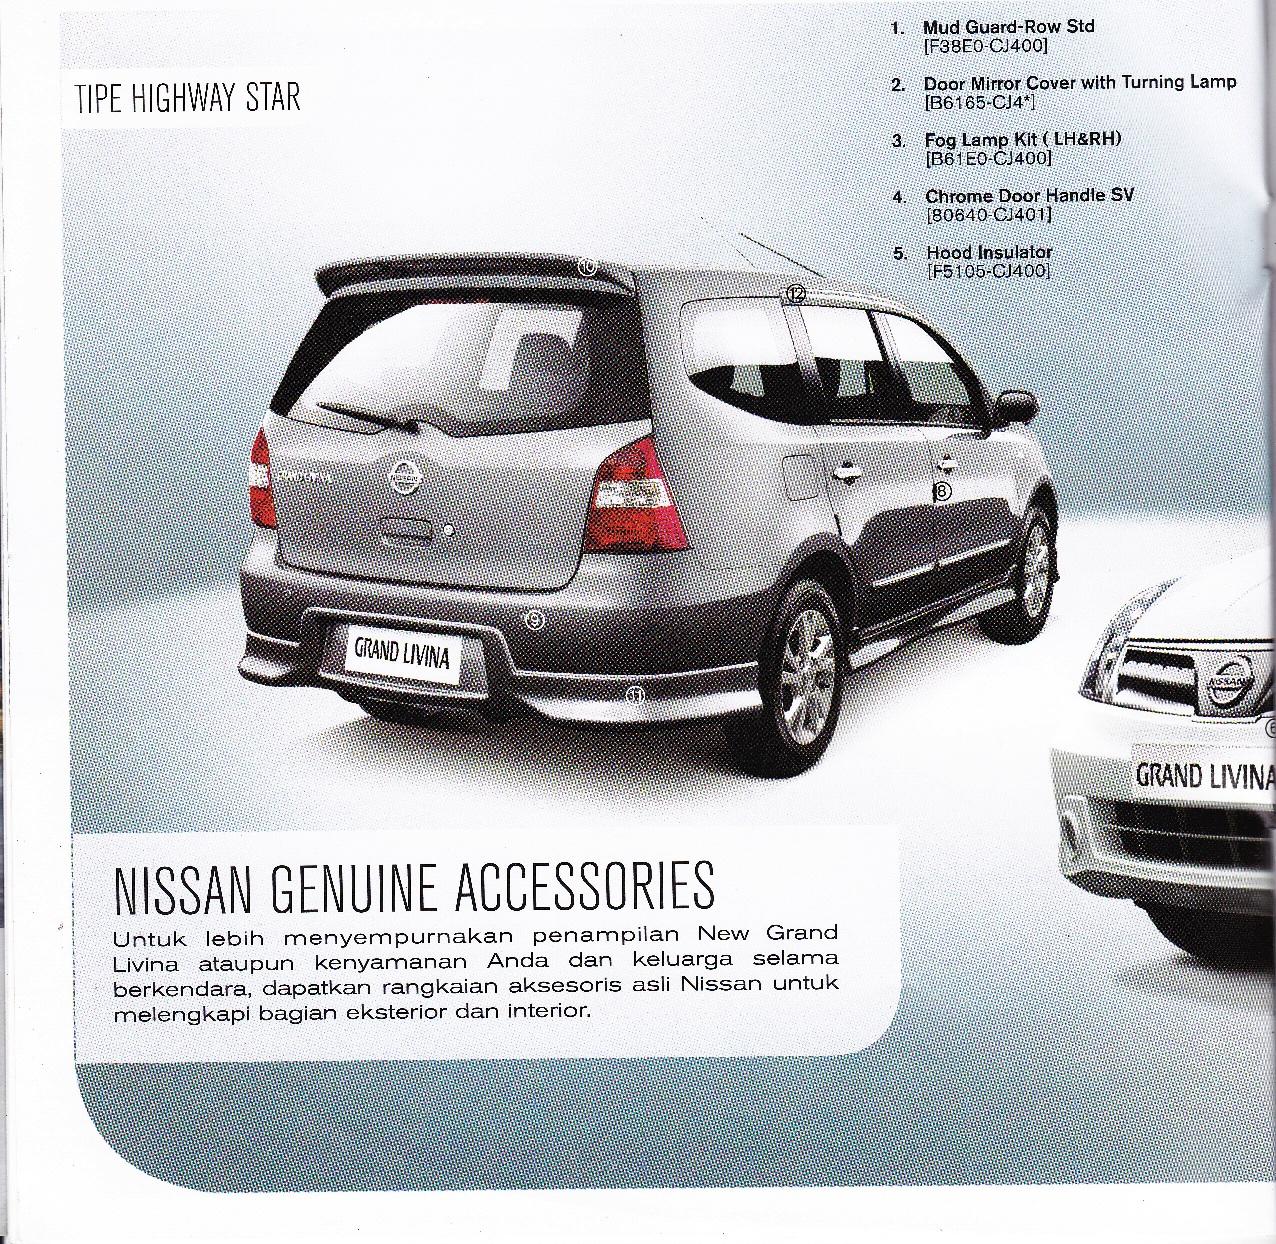 Andy Nissan Malang 081217493783 Brosur Grand Livina Fog Lamp 2012 Complete Wijaya 03419316510